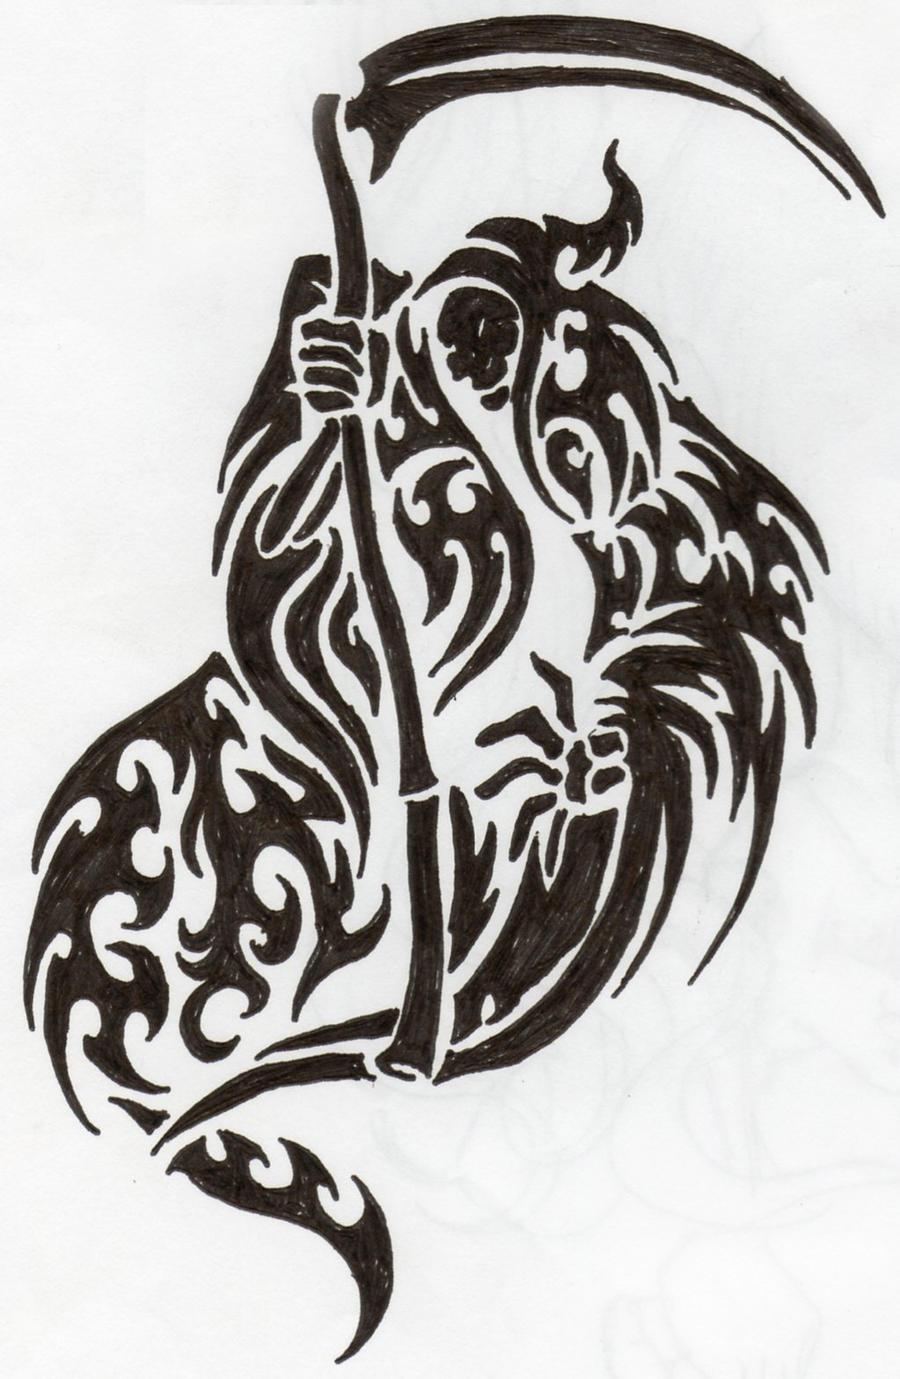 Tribal Death Tattoo: Death Tribal By Pibraclab On DeviantART